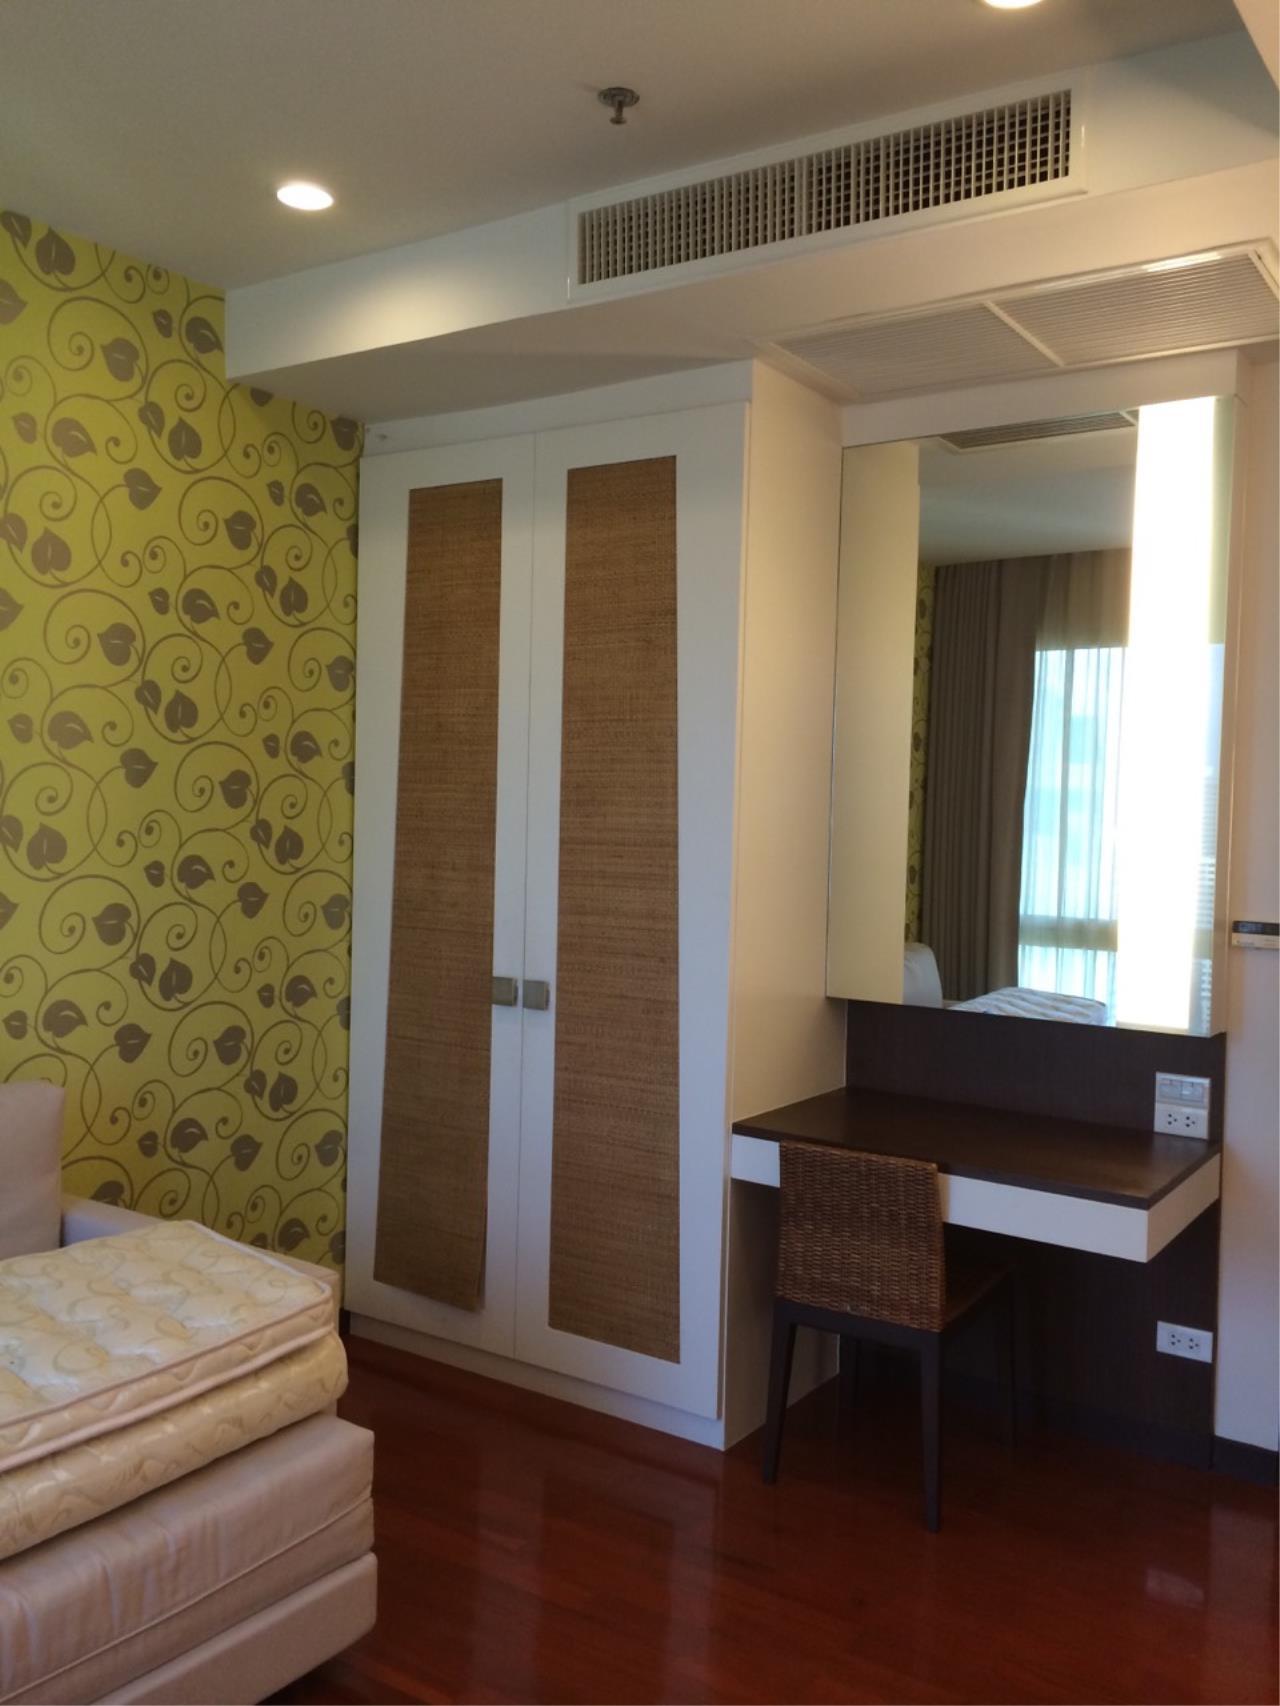 Cityhomes Agency's Condominium for Sale/Rent 20